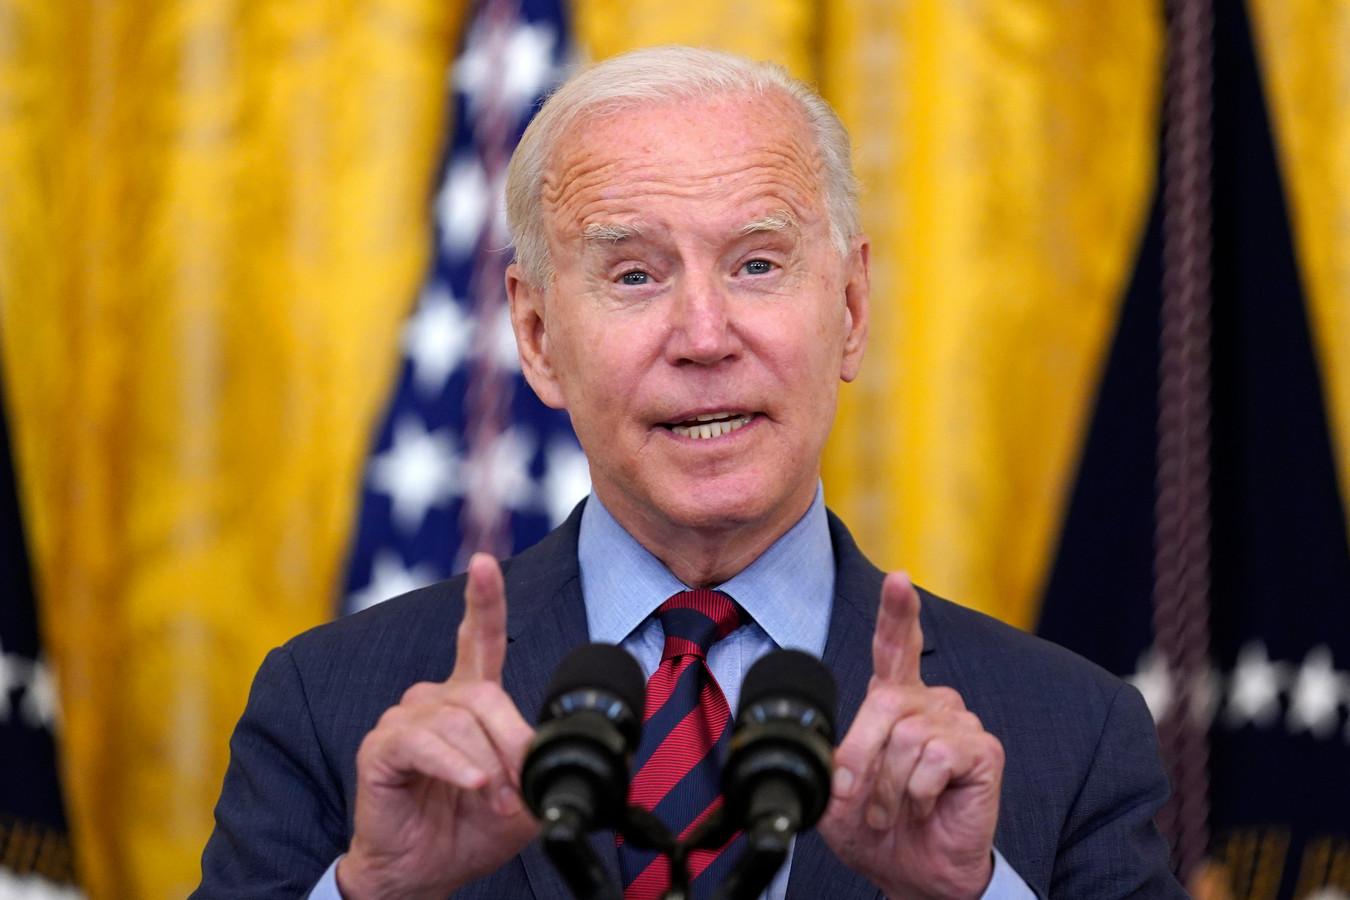 President Joe Biden